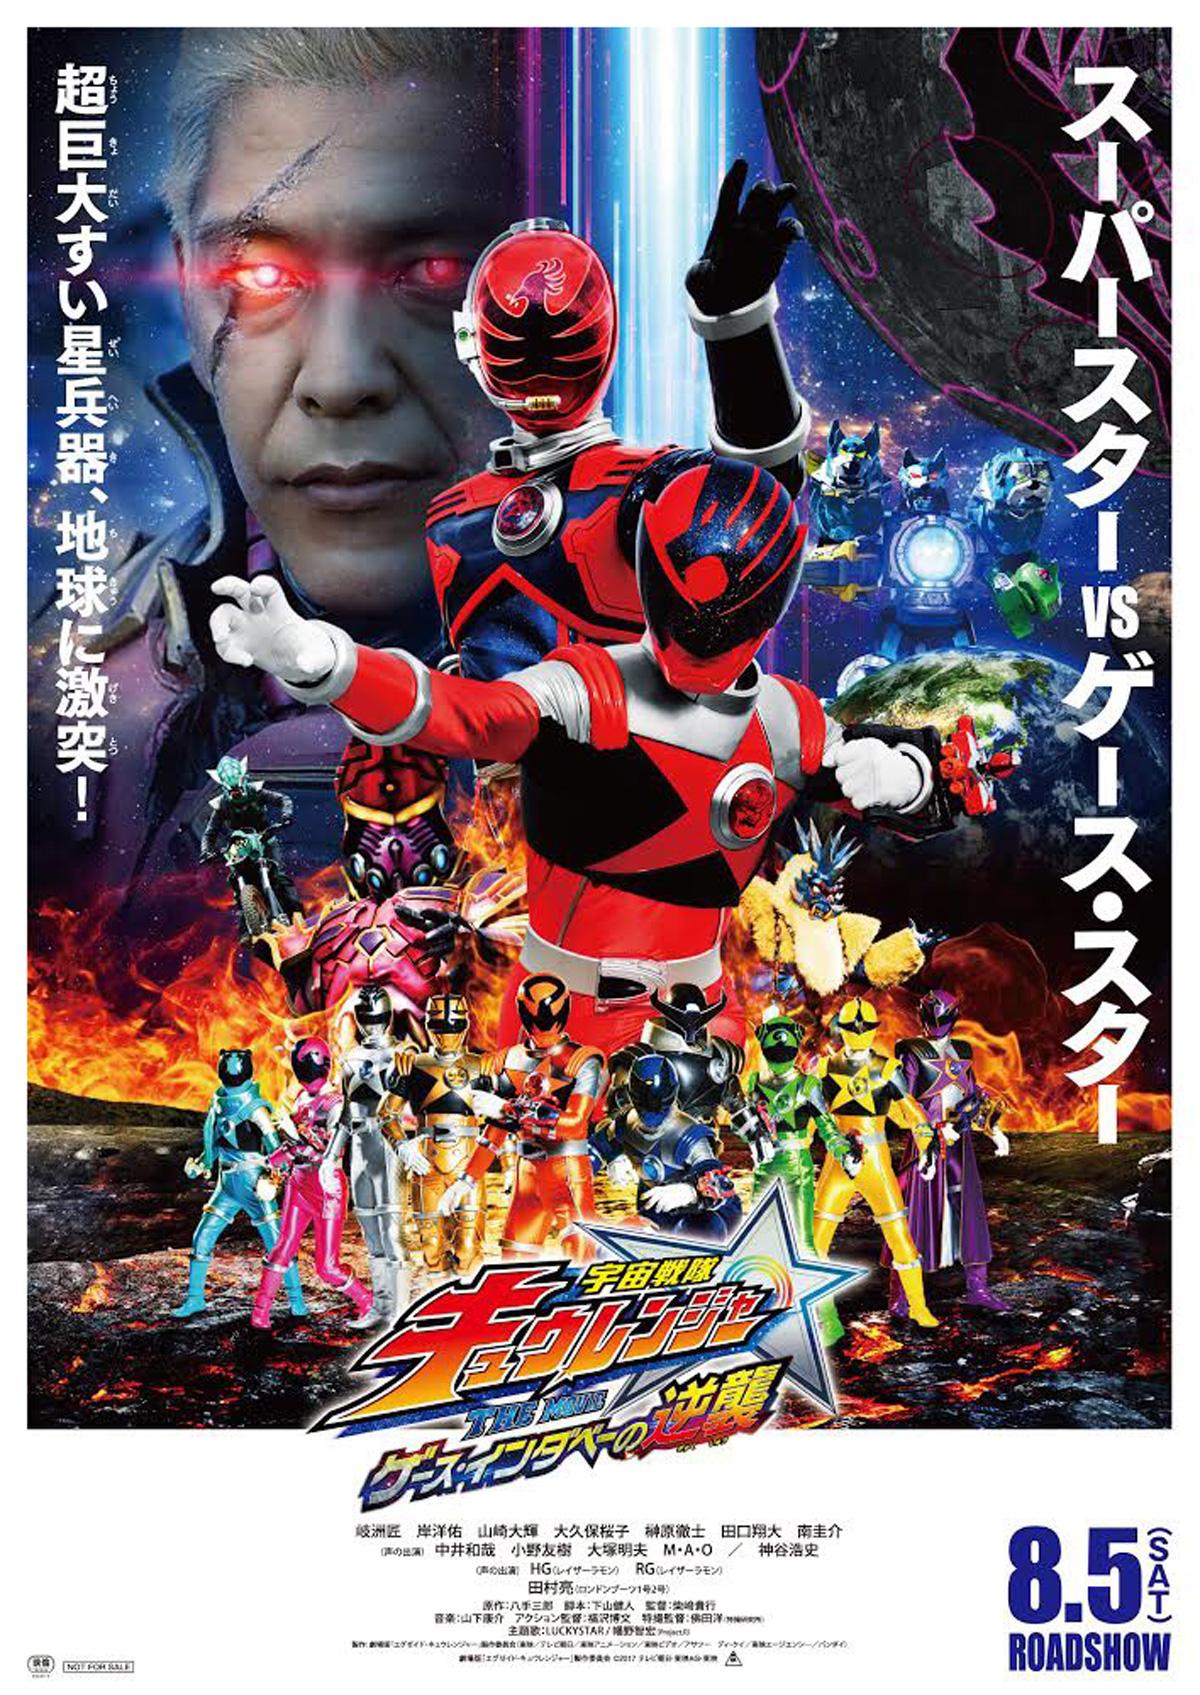 Uchu Sentai Kyuranger The Movie: The Geth Indaver's Counterattack